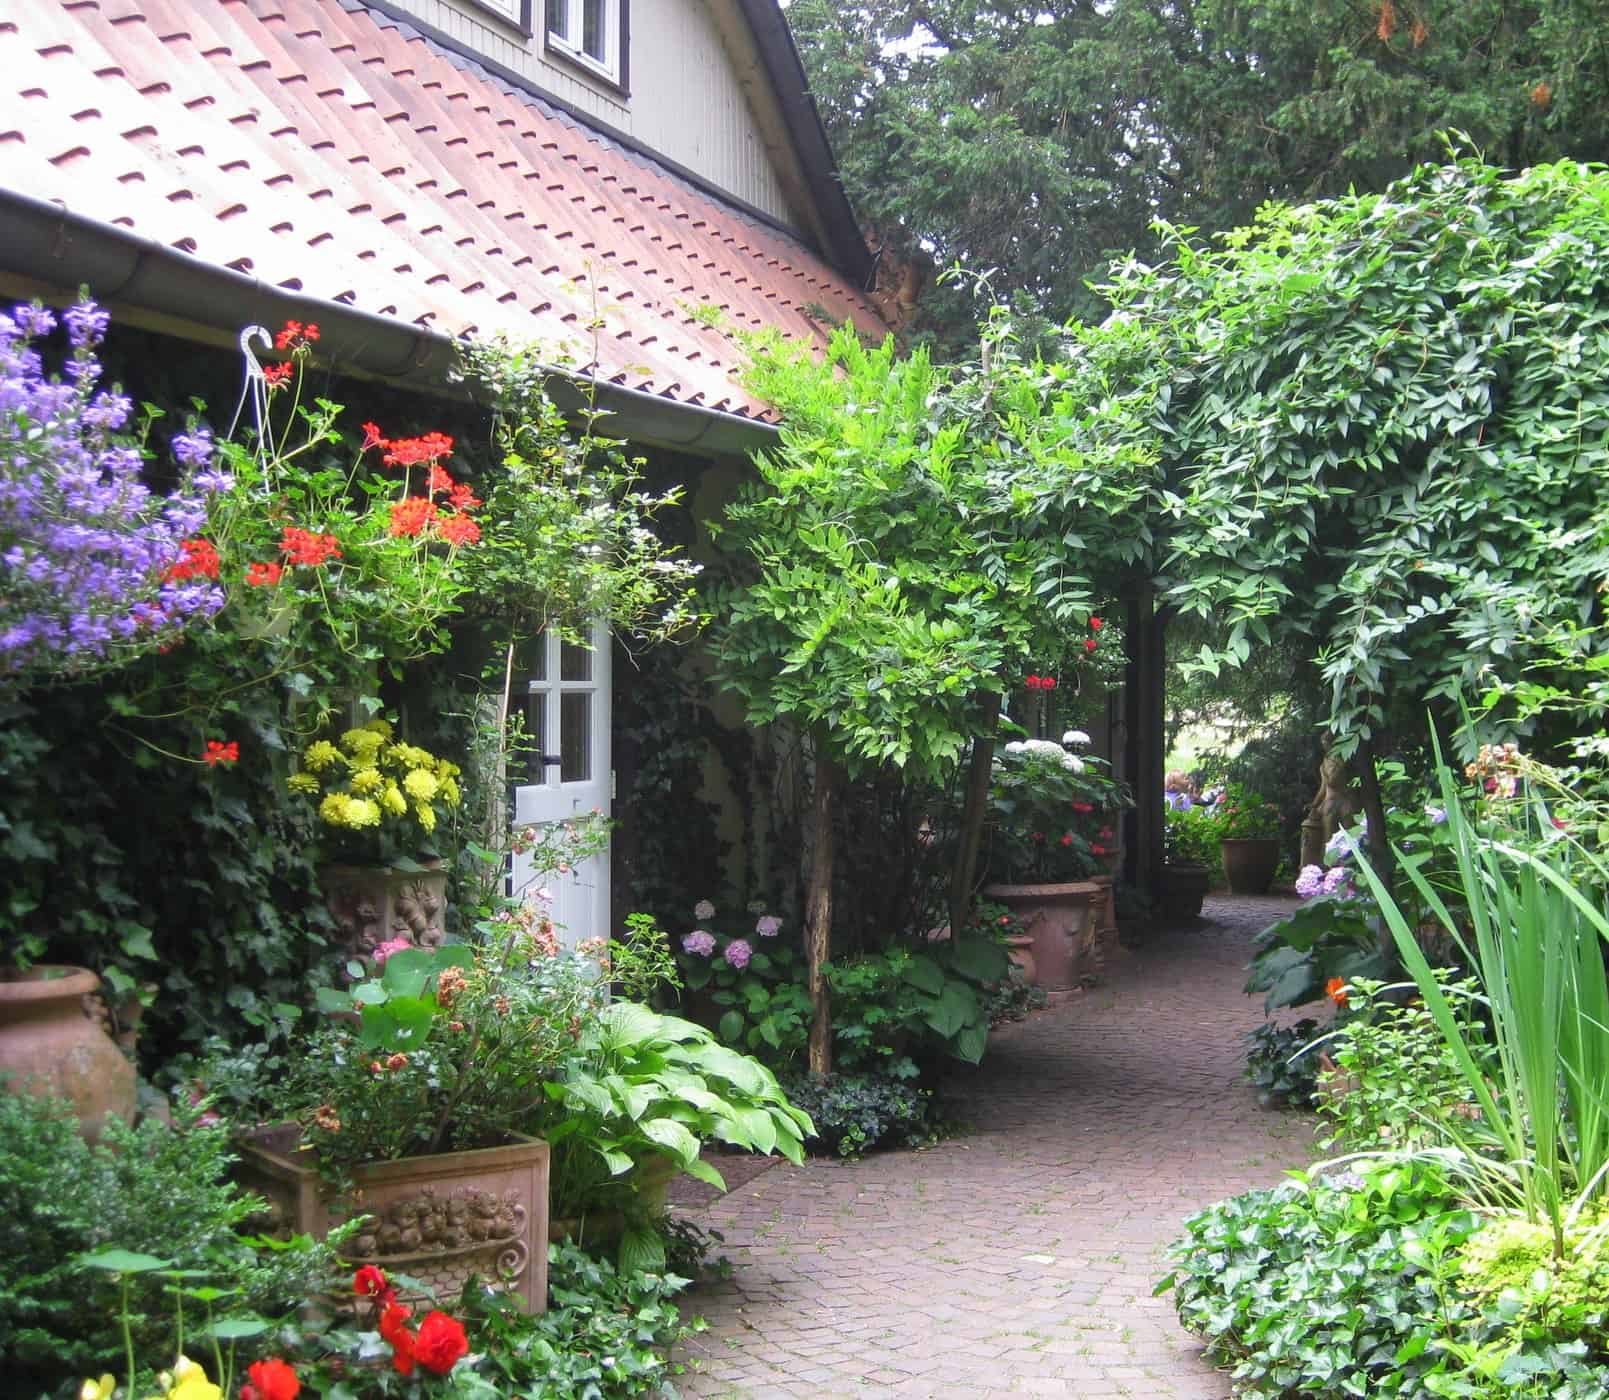 Cafe im Rilke-Haus, Fischerhude, Germany